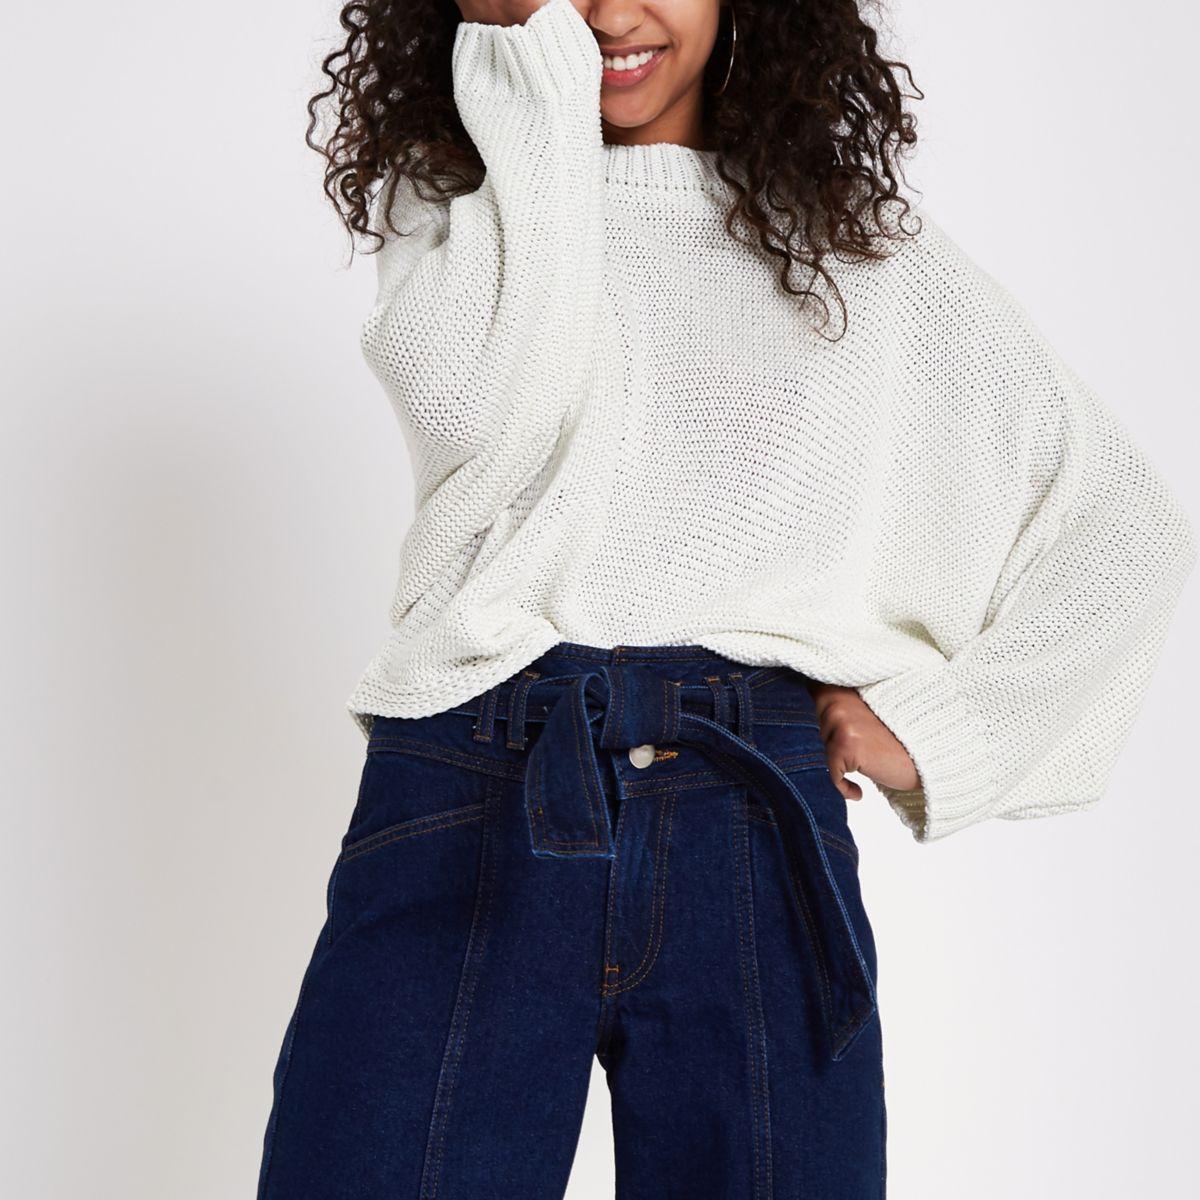 White batwing sweater